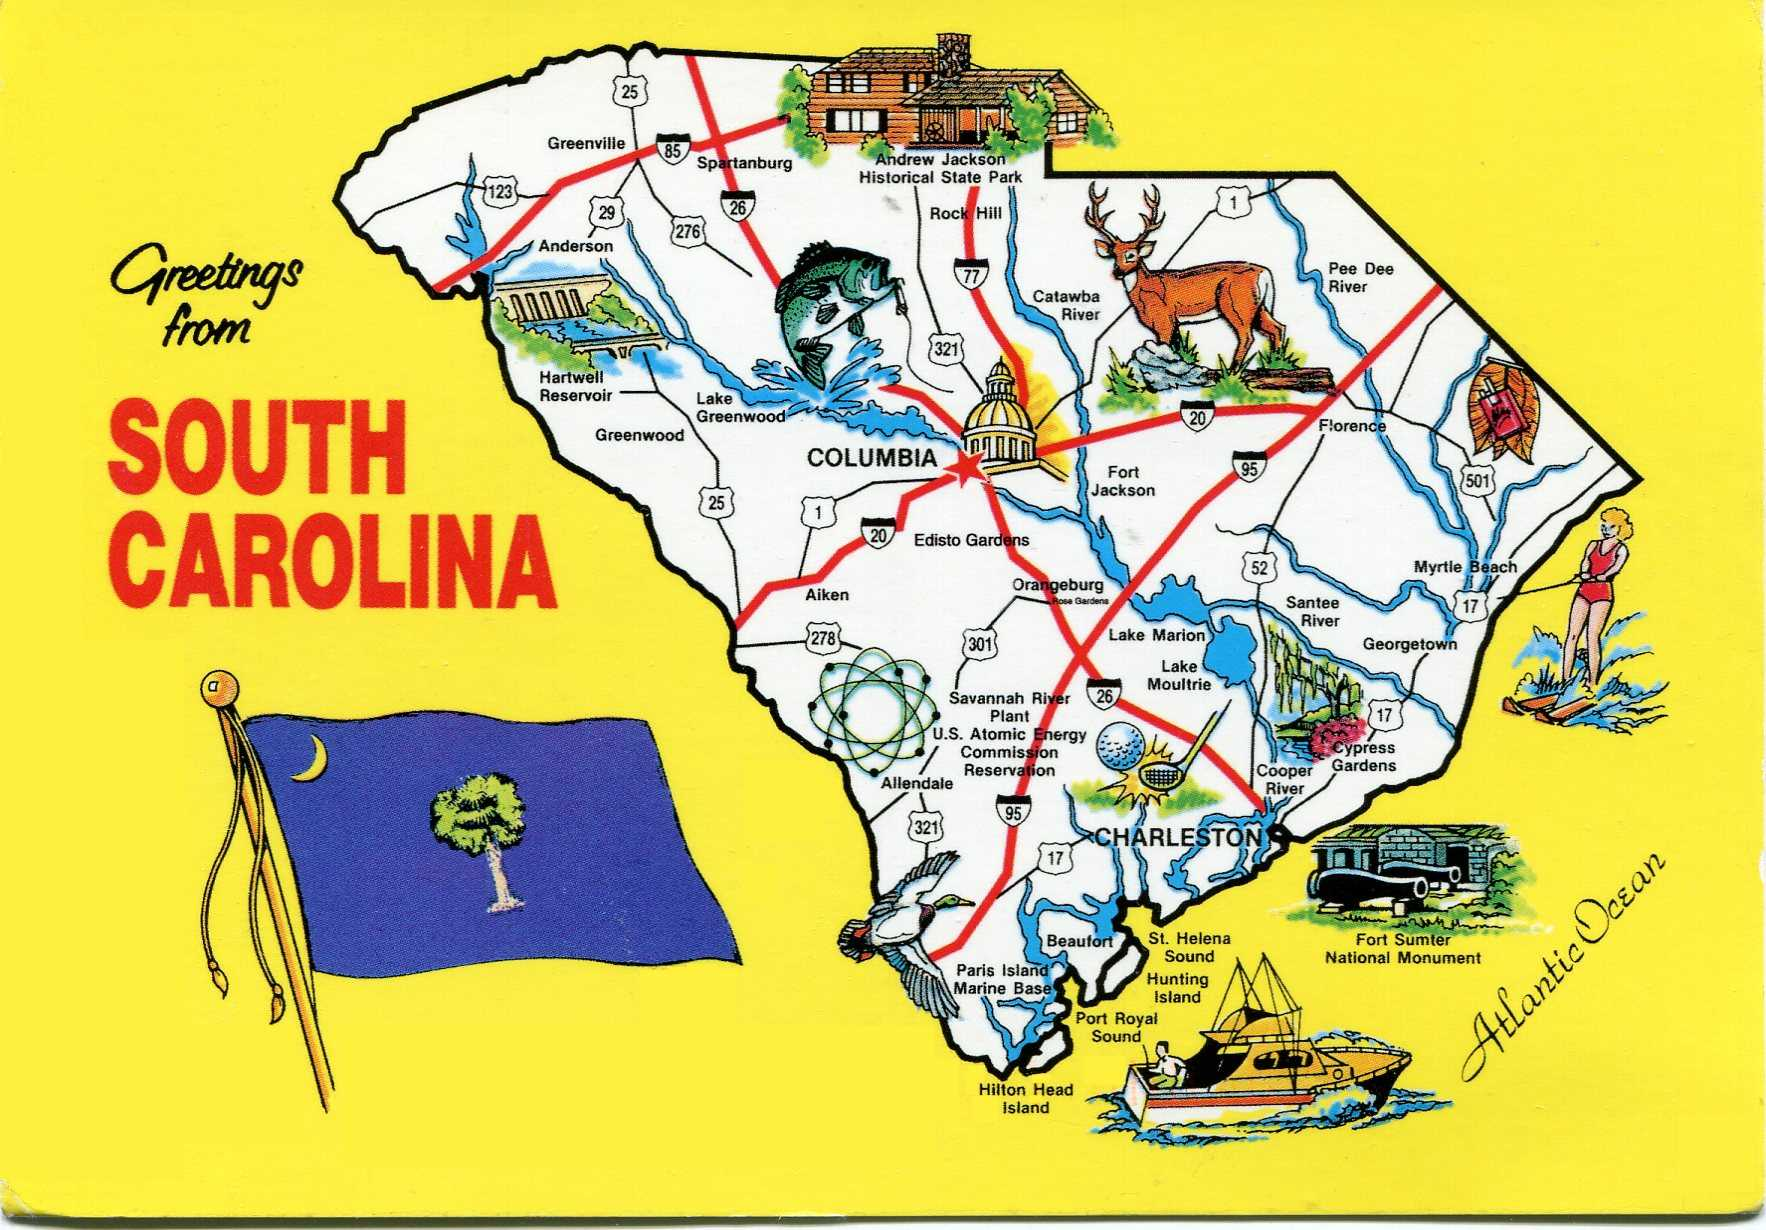 North charleston south carolina city information epodunk - North Charleston South Carolina City Information Epodunk An Old Sc Greetings Postcard Download